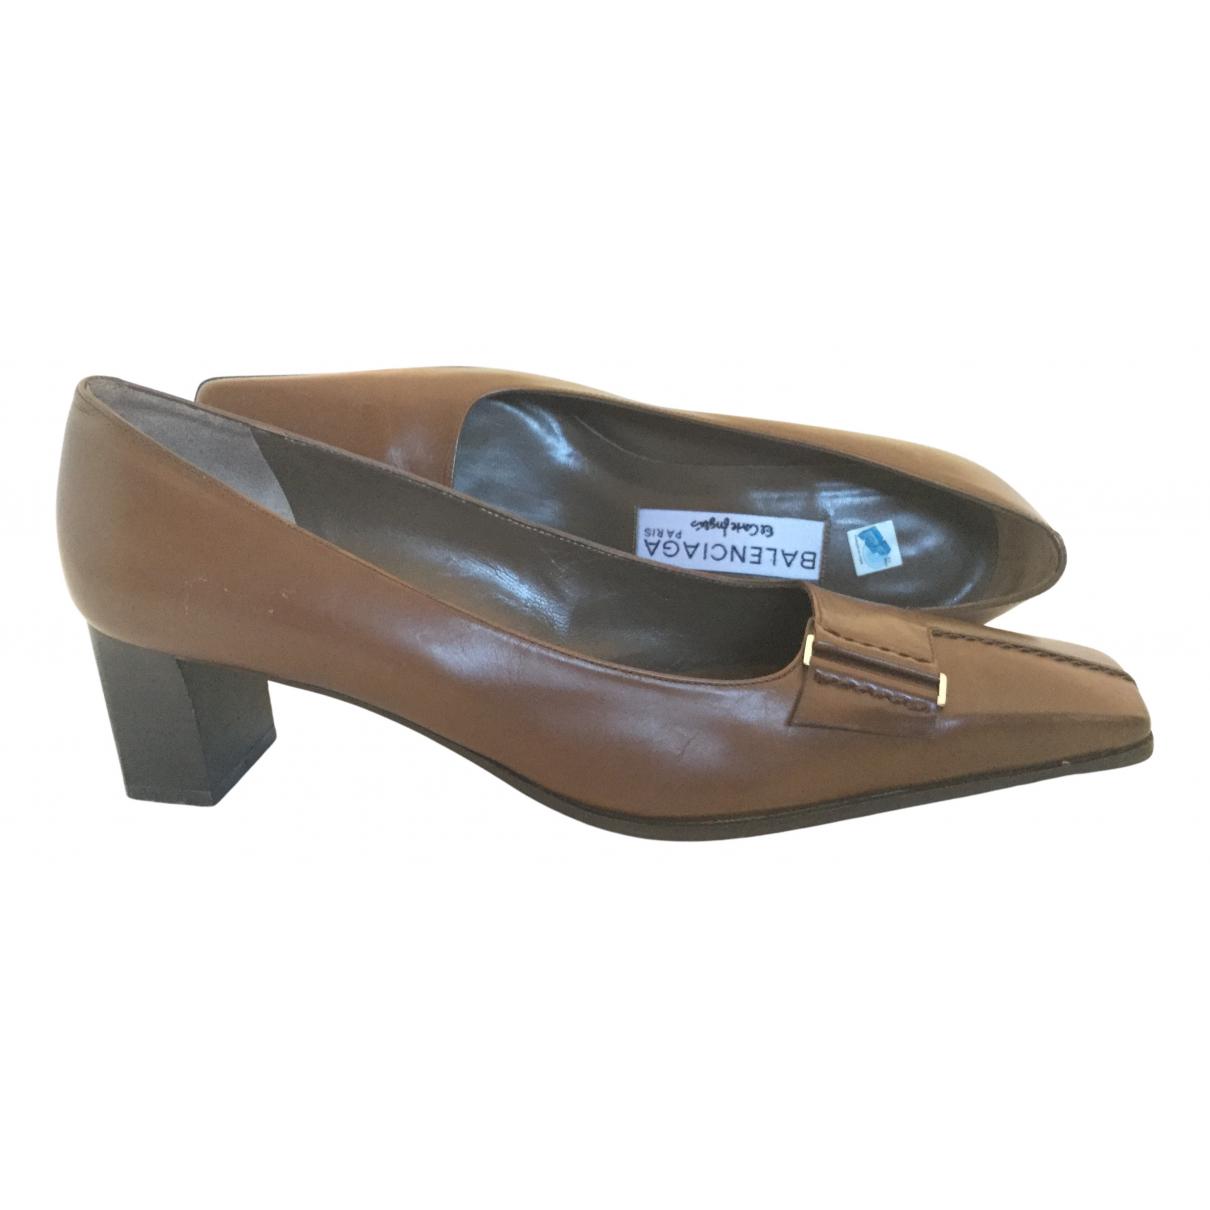 Balenciaga N Brown Leather Heels for Women 37 EU